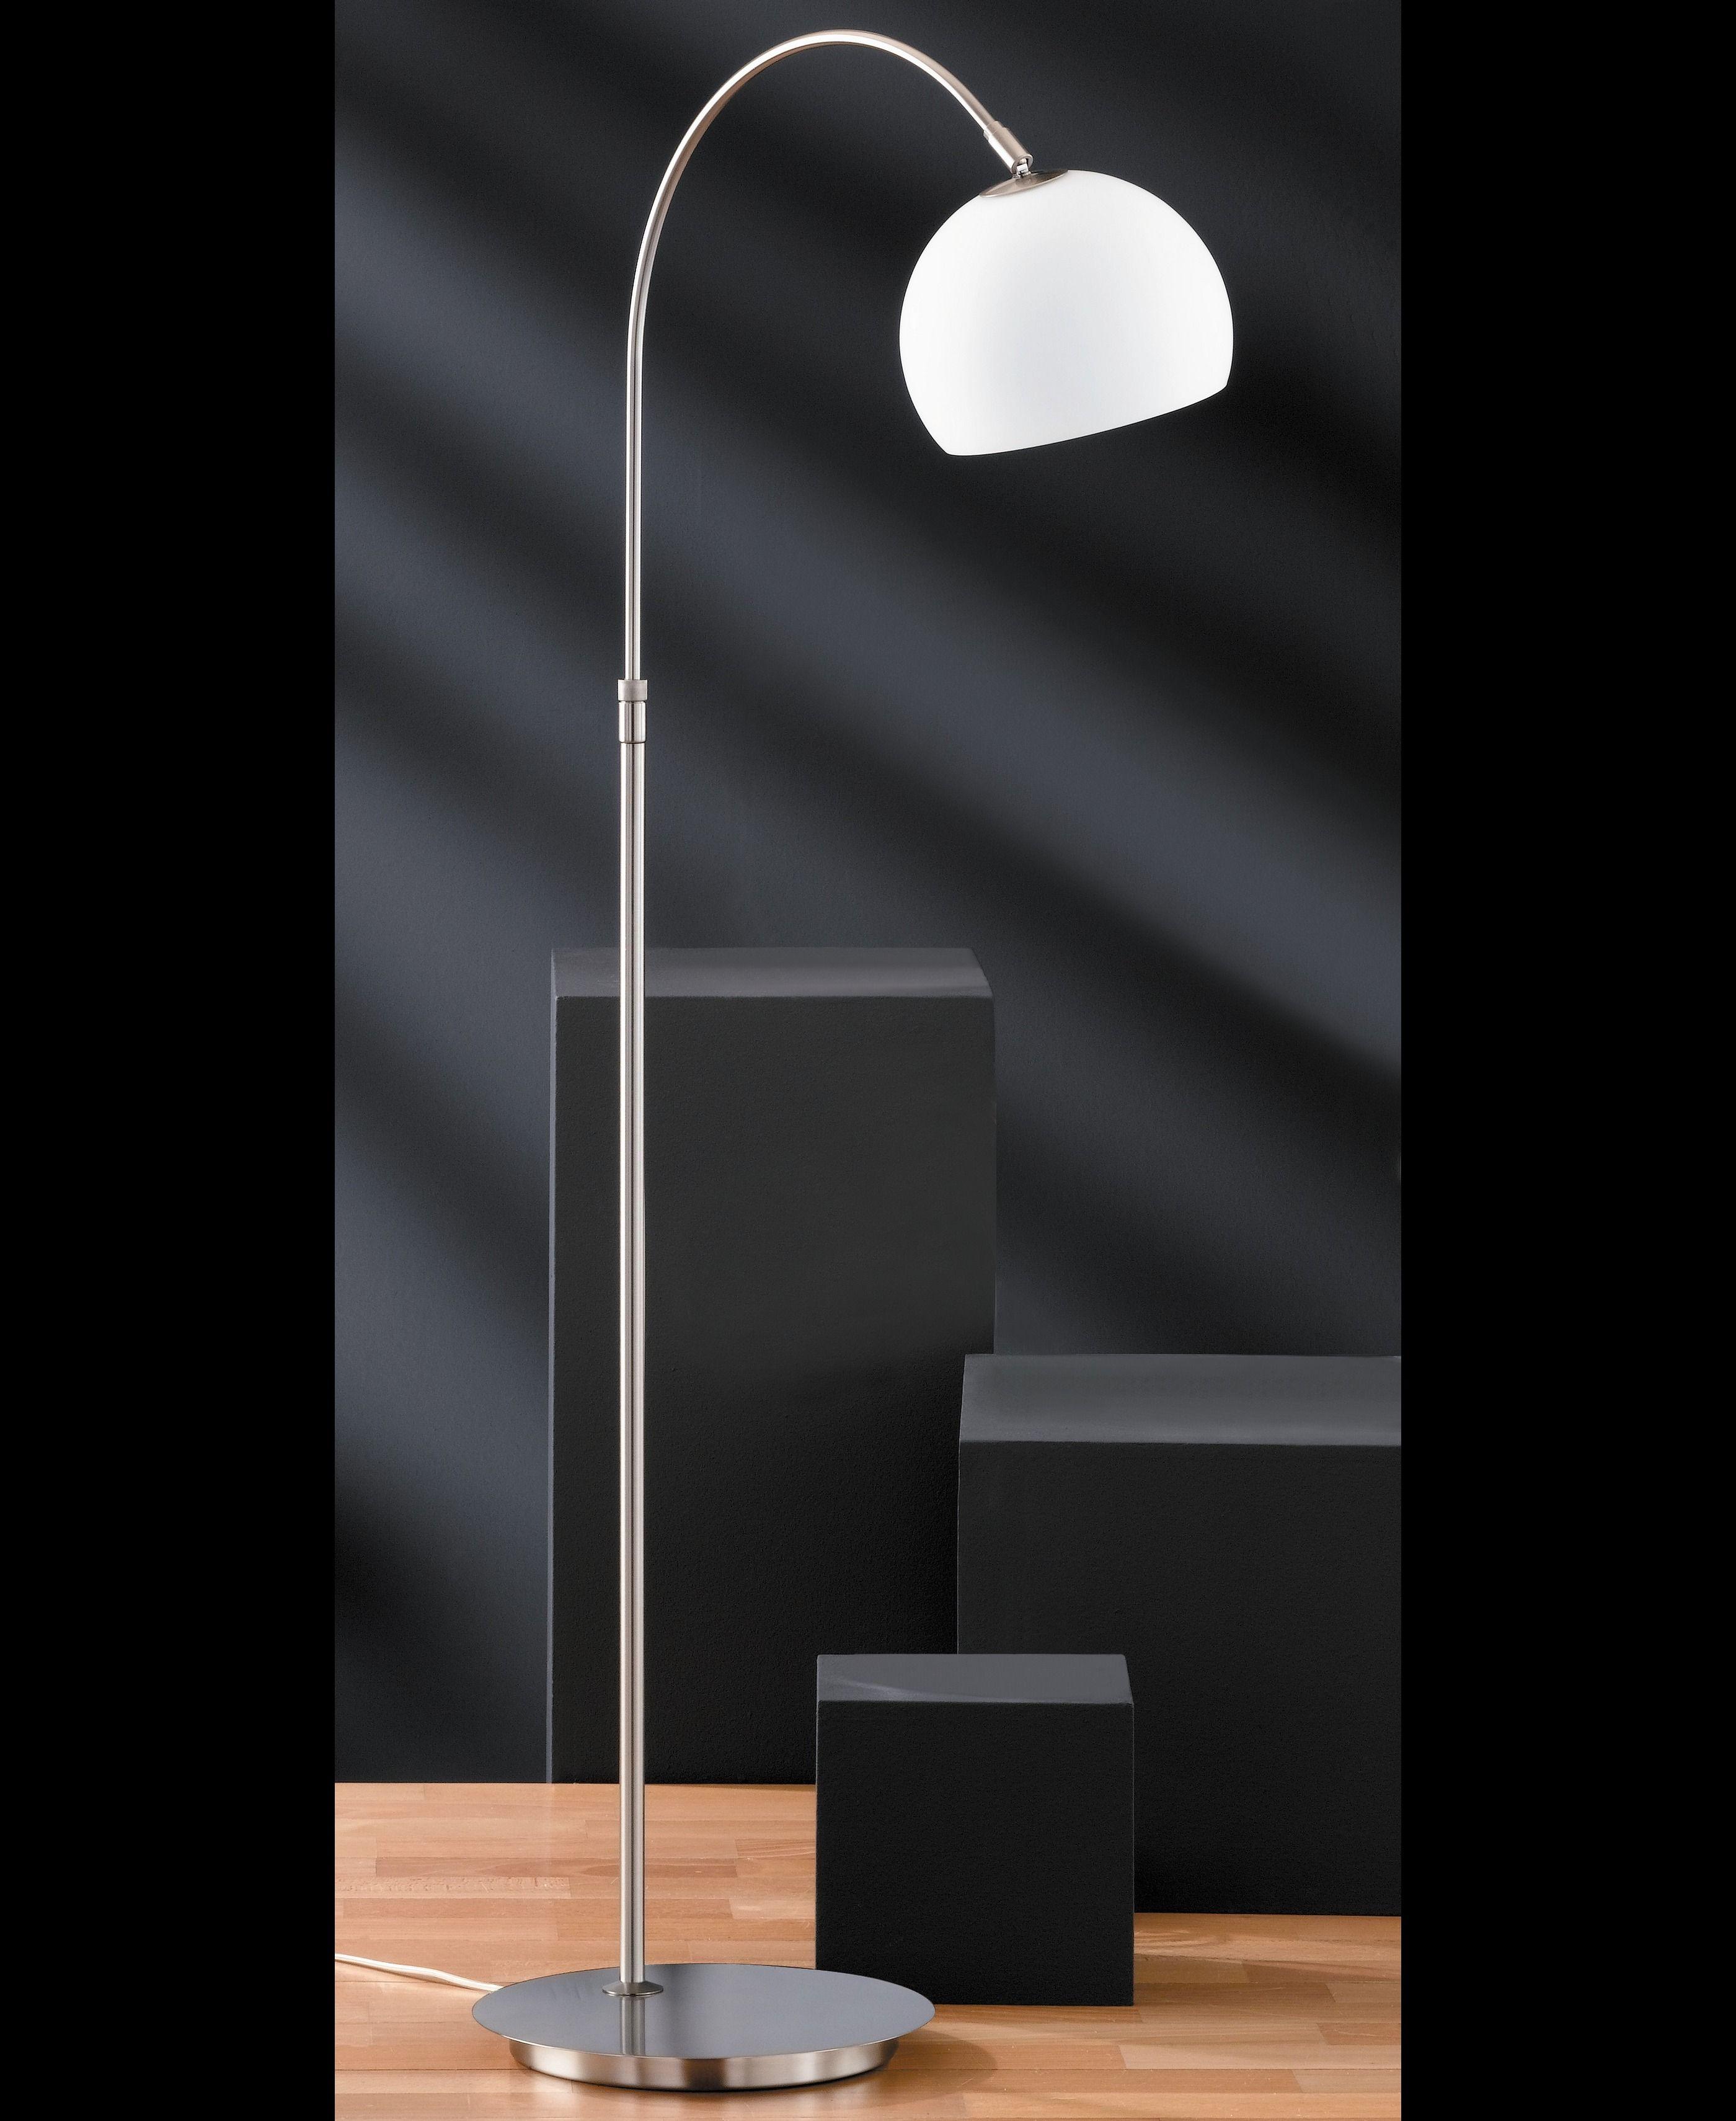 a6e82af09b0fd4e2eb927eb130c4446f Faszinierend Stehlampe Studio Schwarz Gold Dekorationen